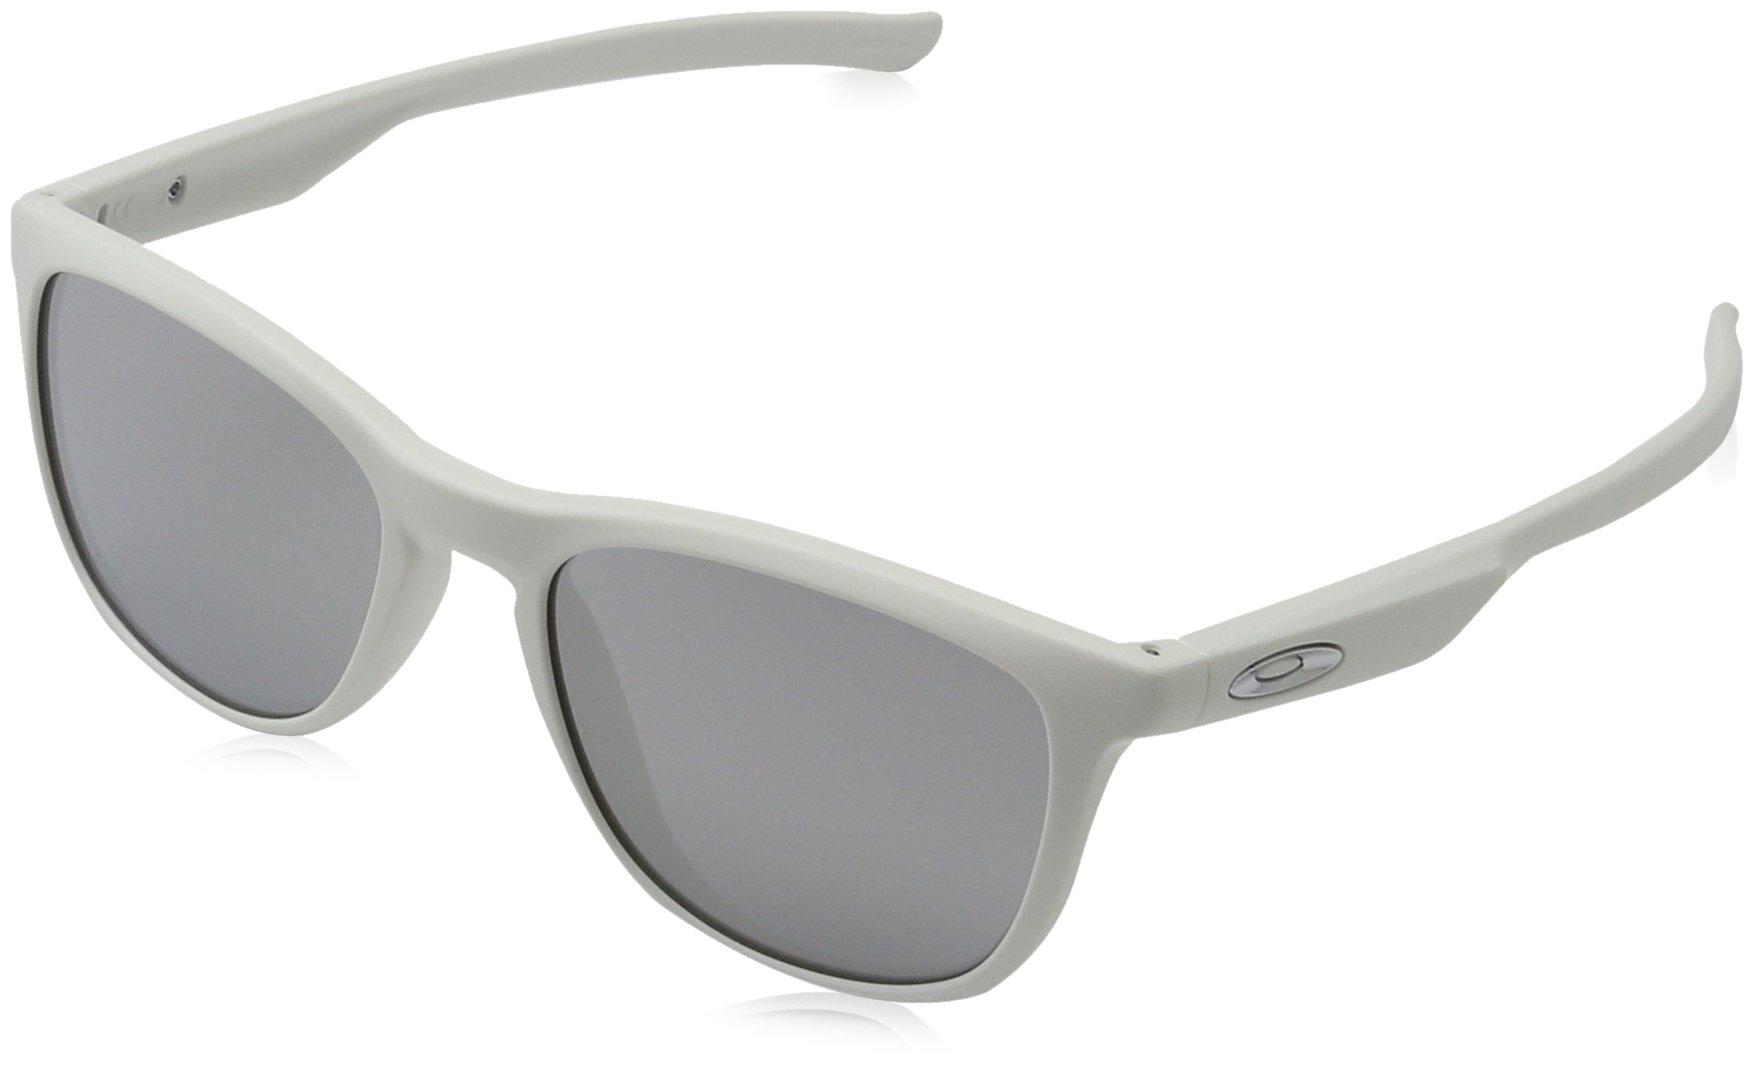 Oakley Men's Trillbe X Non-Polarized Iridium Rectangular Sunglasses, Matte White, 52 mm